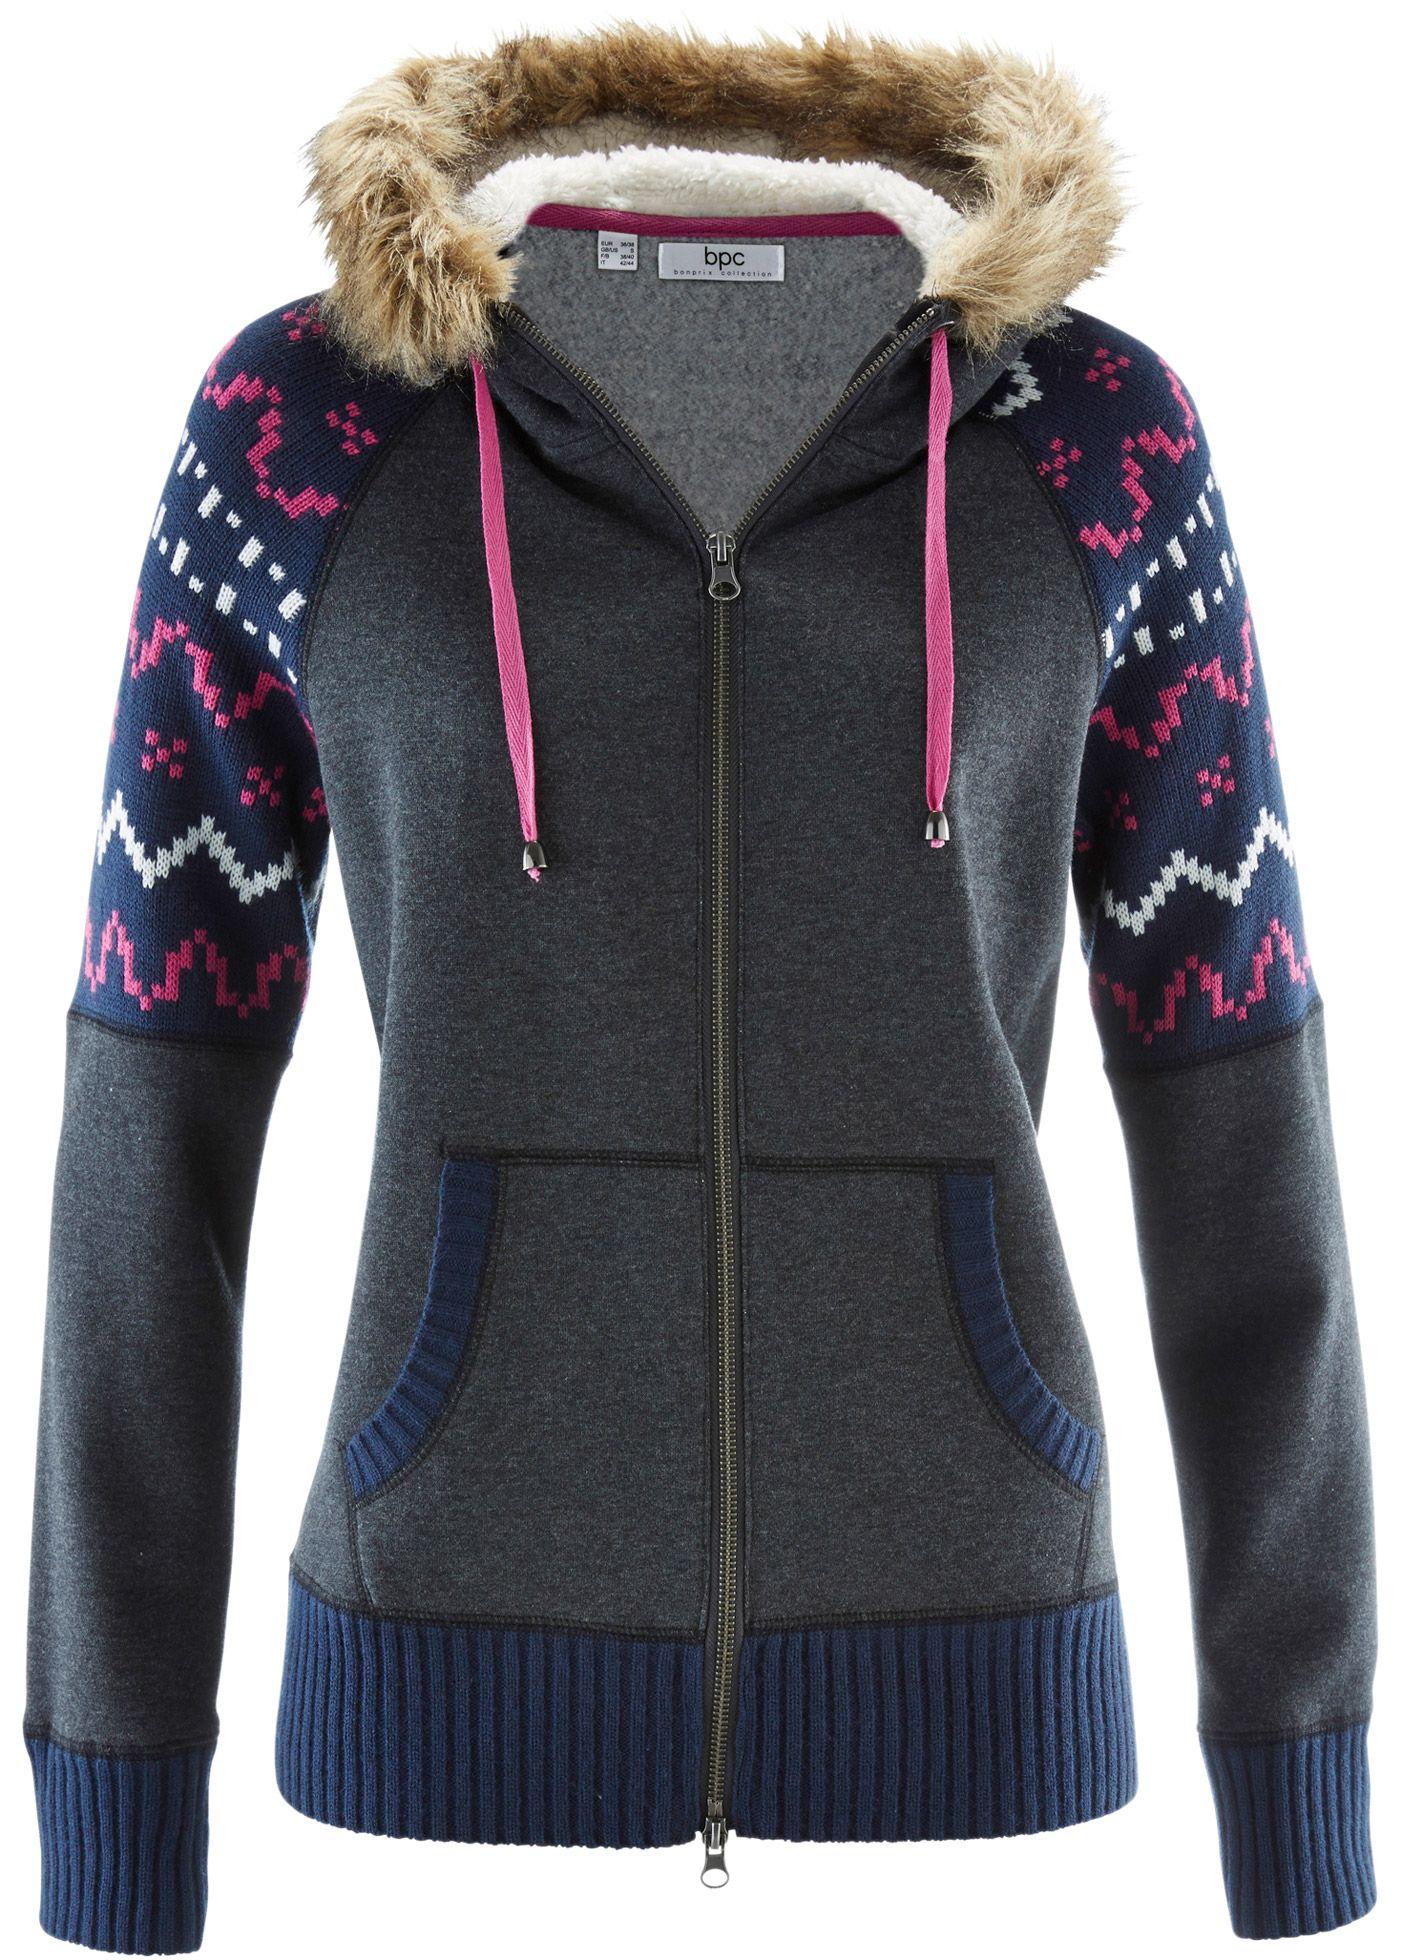 6907a6e24cc5b4 Sweatvest | women's fashion | Hooded jacket, Sweaters, Jackets